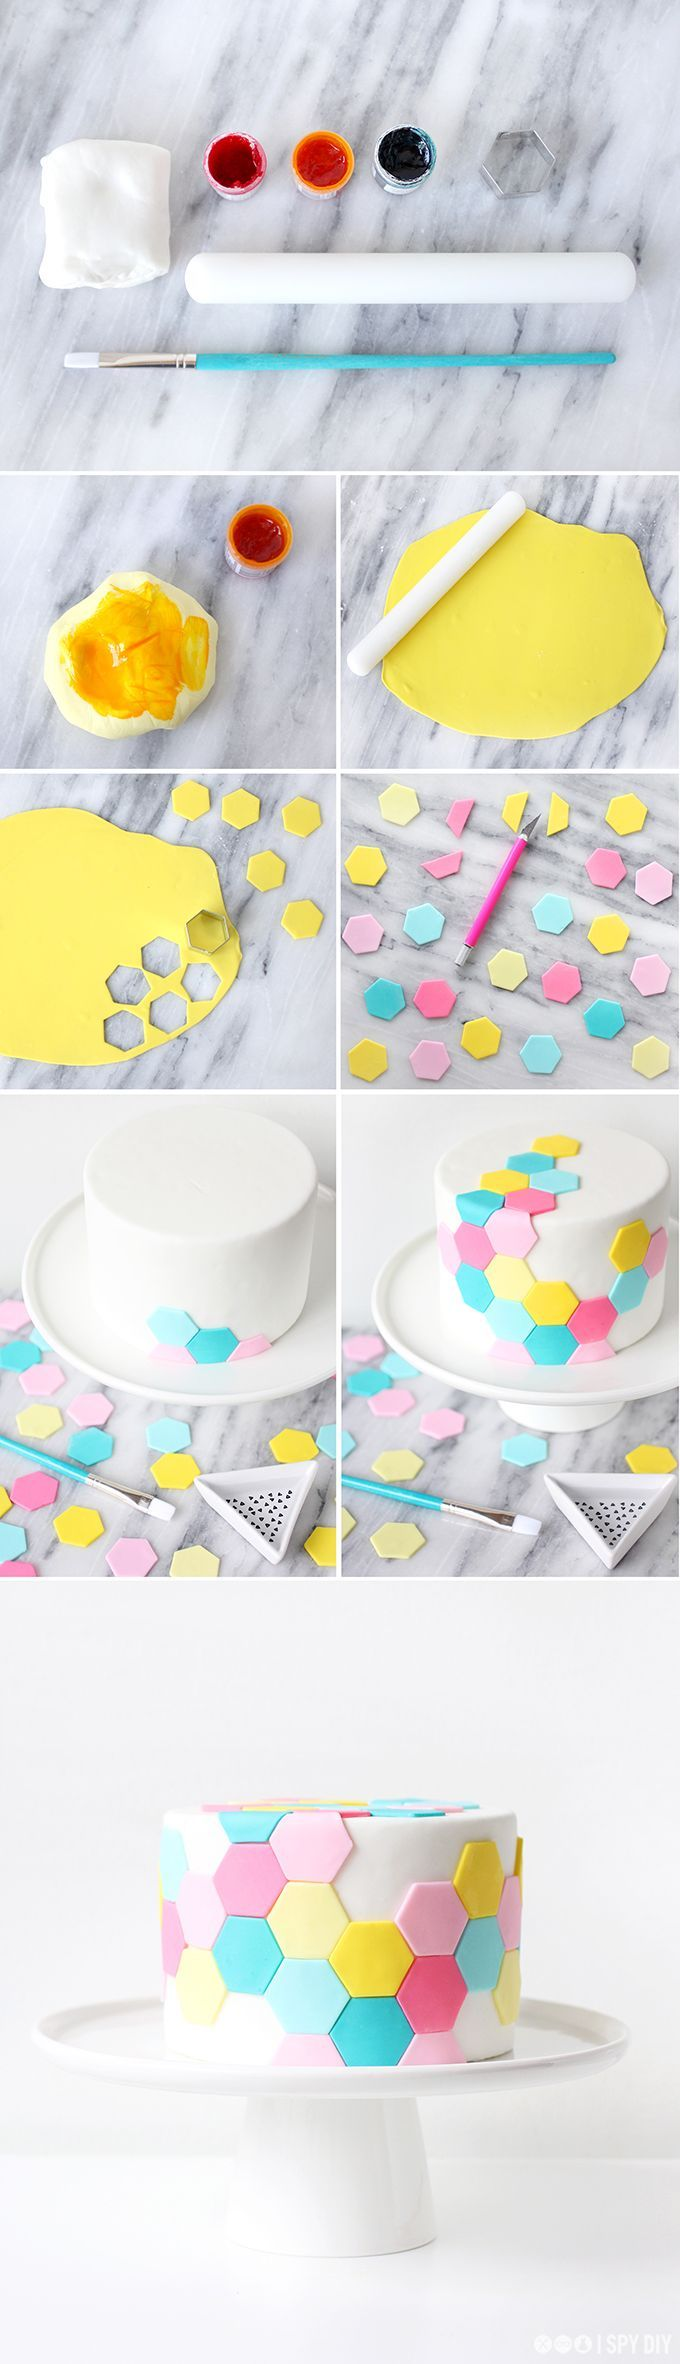 SWEET STEPS   Pastel Hexagon Tile Cake BY ISPYDIY